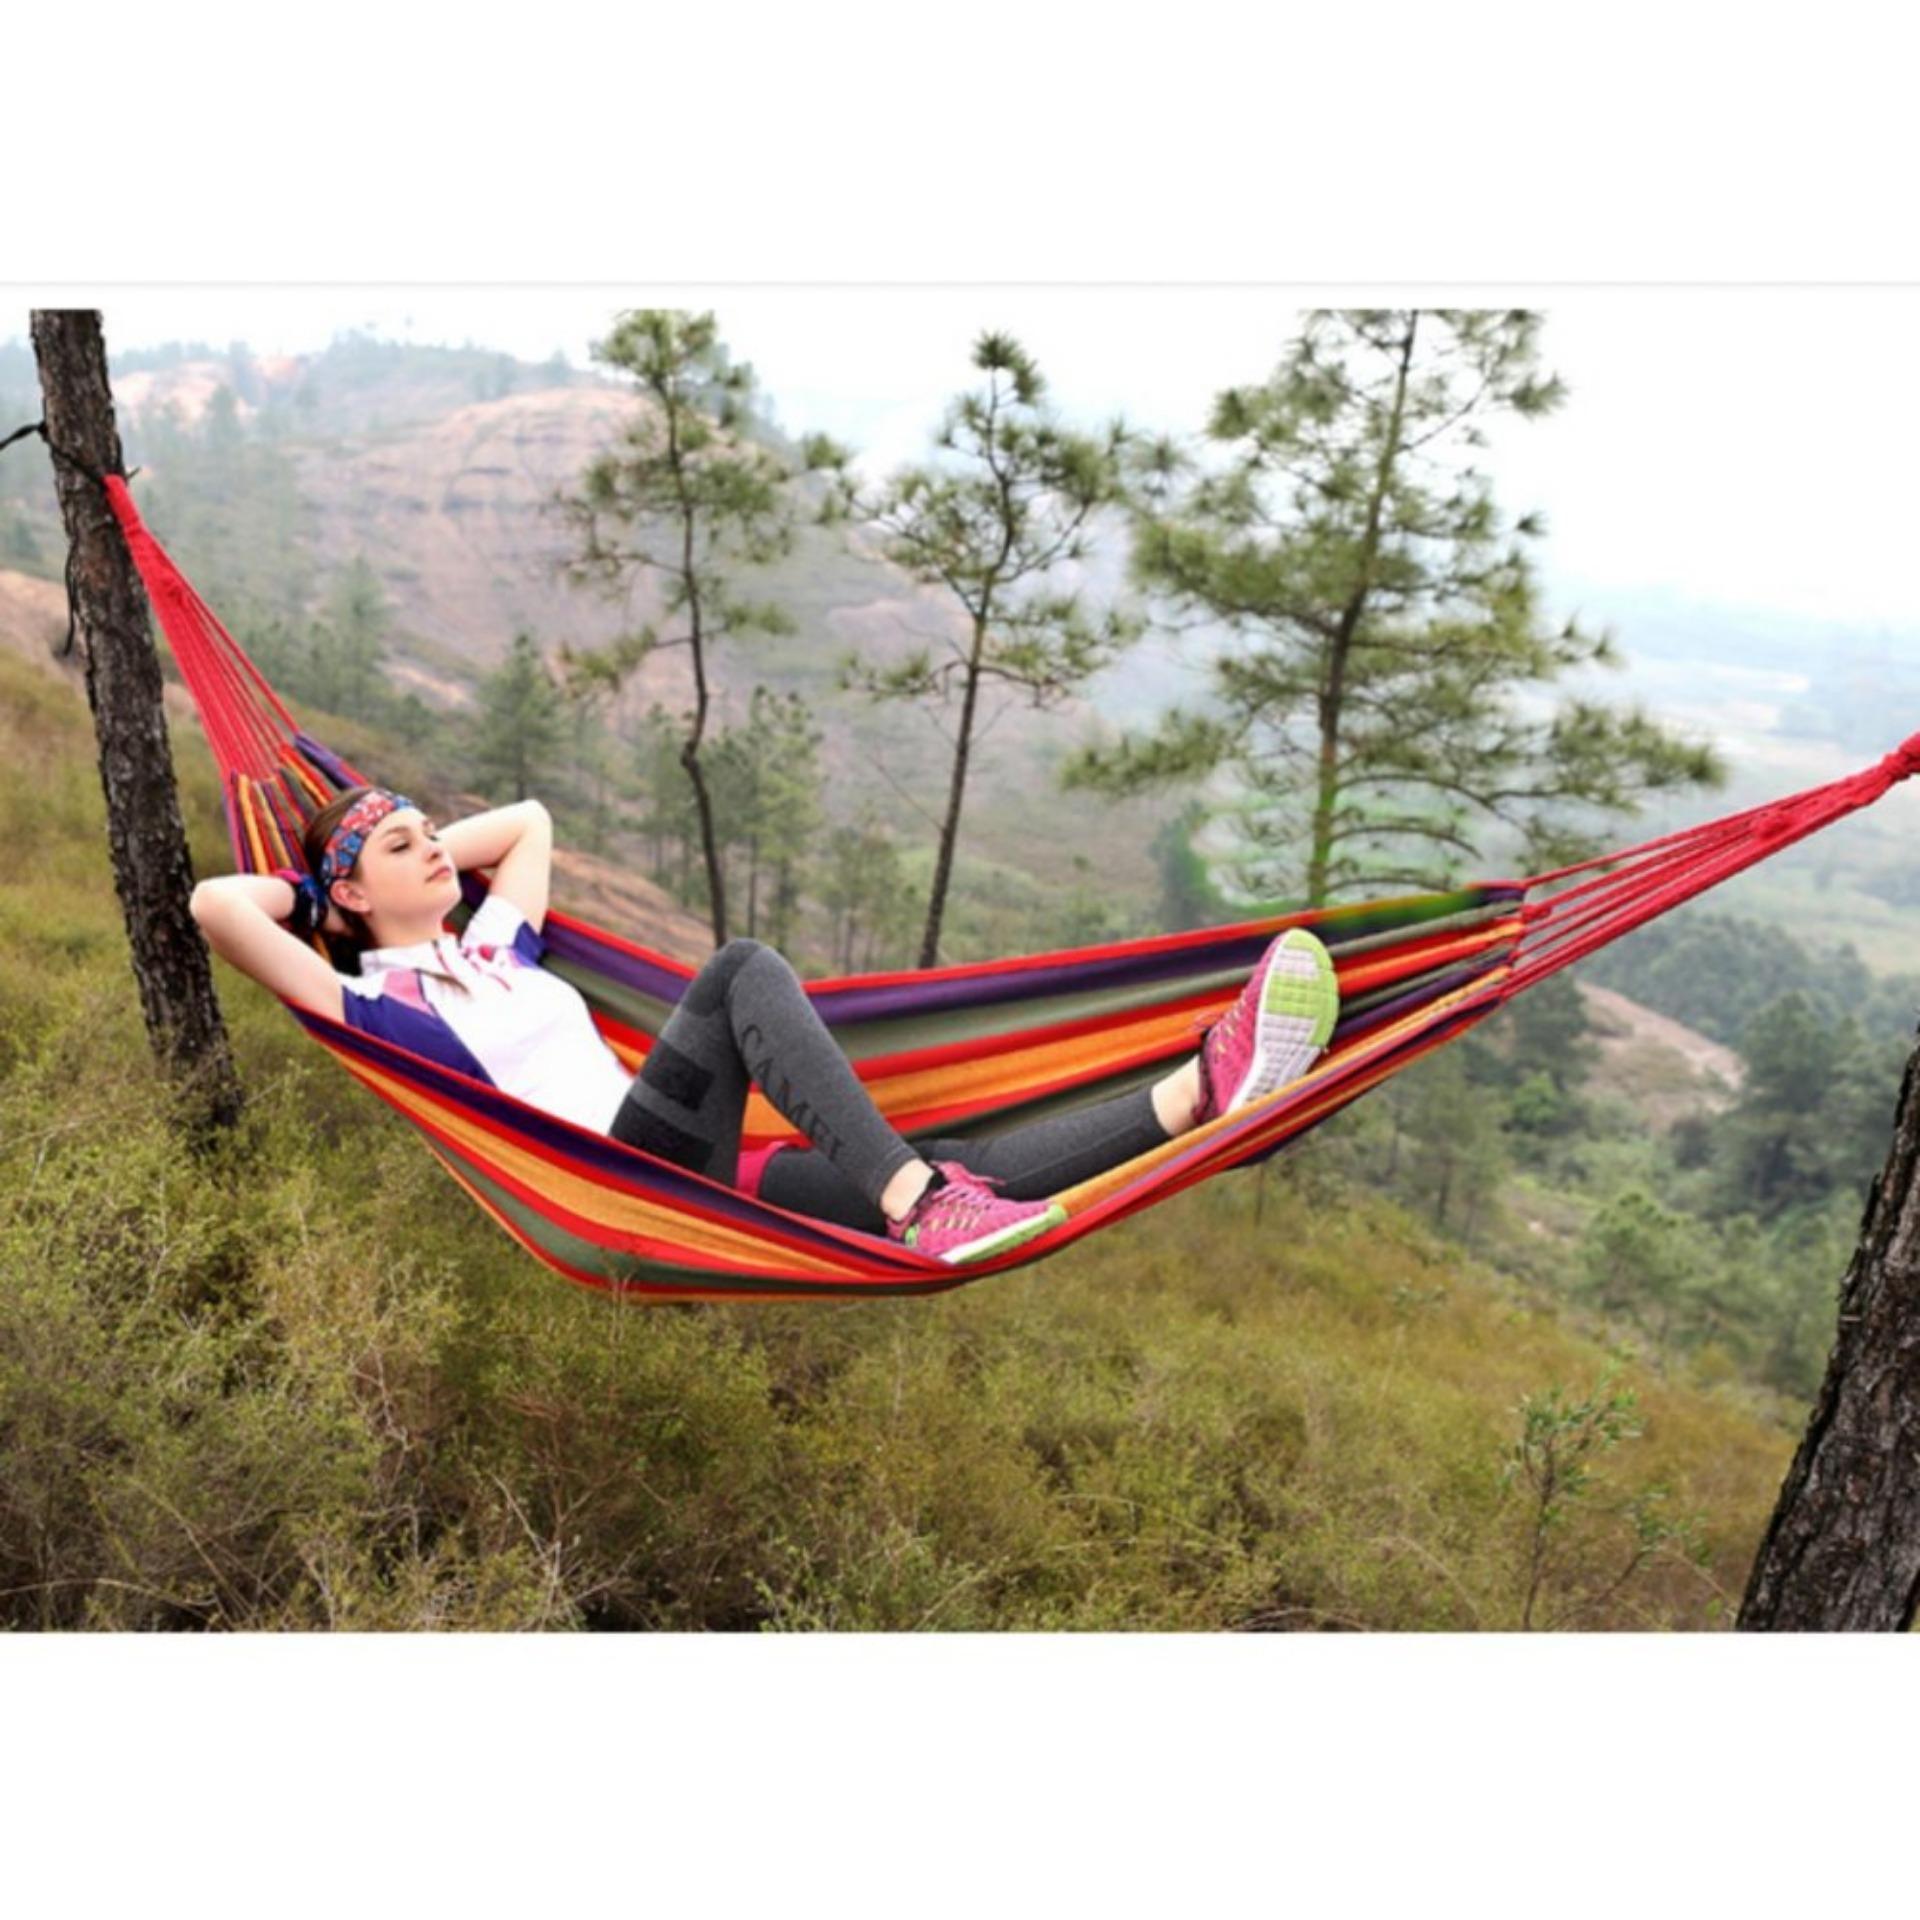 Hammock Single Folding Outdoor Tempat Tidur Gantung Pohon Tiang Ayunan